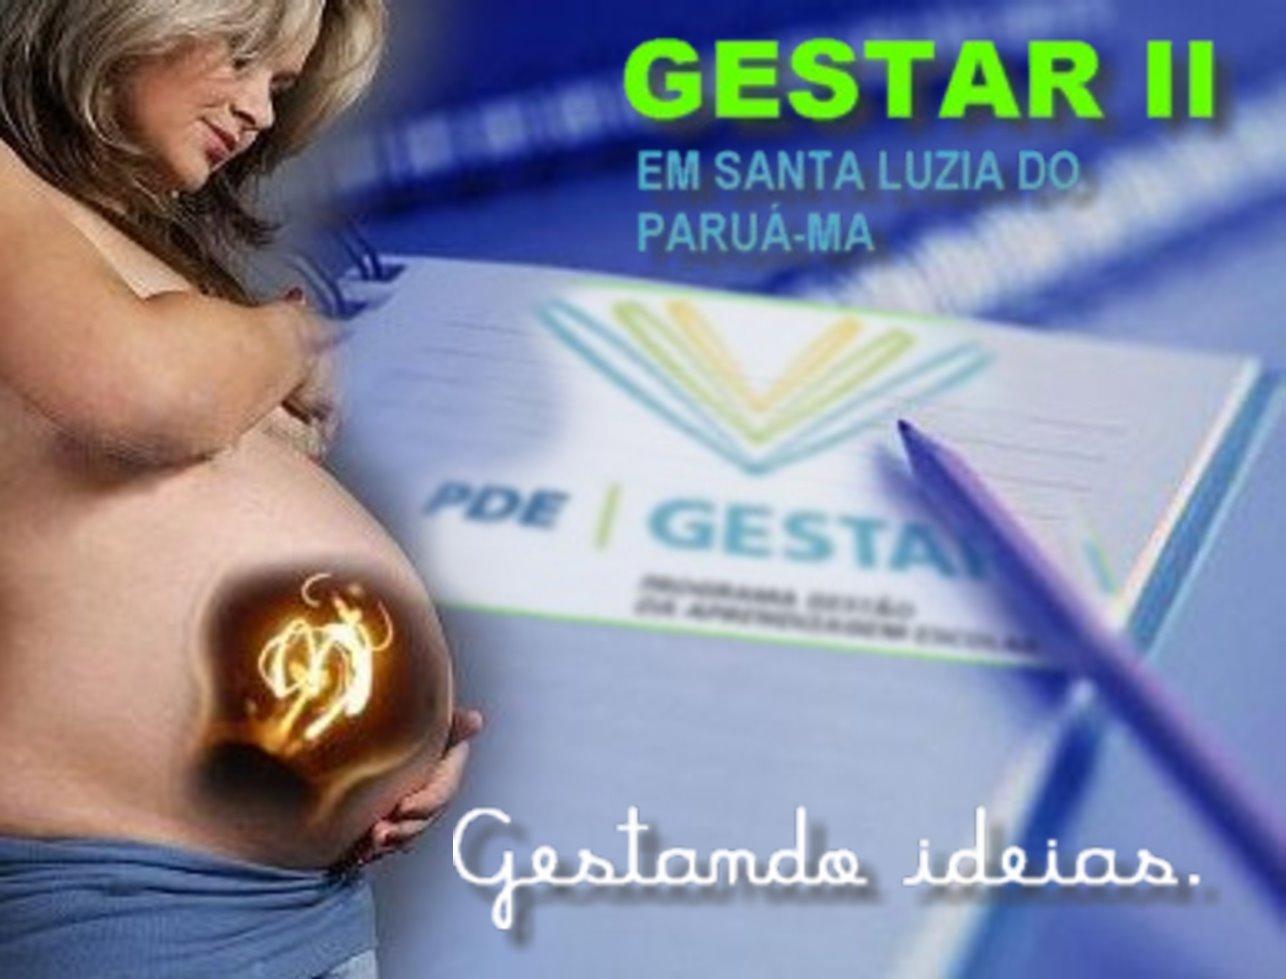 GESTAR II EM SANTA LUZIA DO PARUÁ-MA